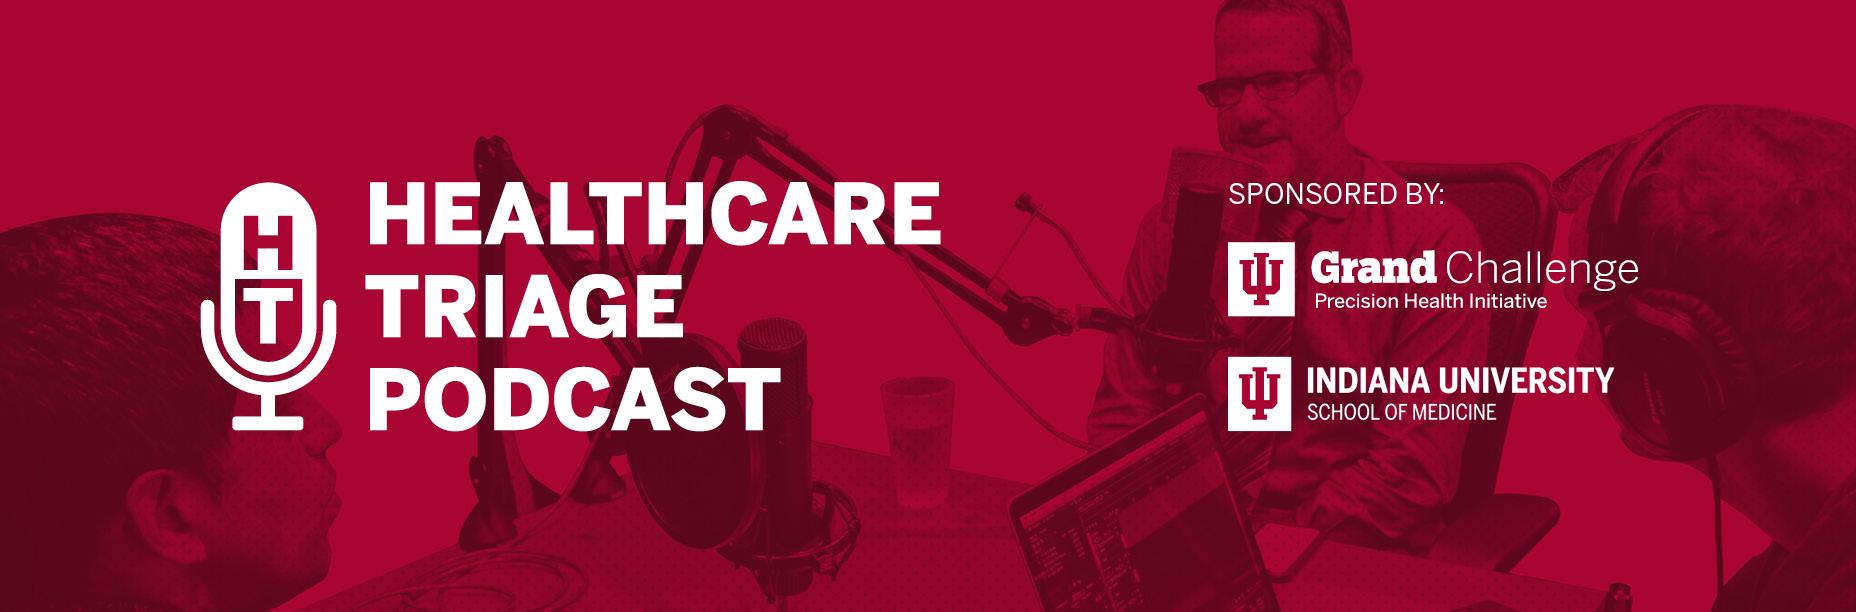 Healthcare Triage podcast web hero